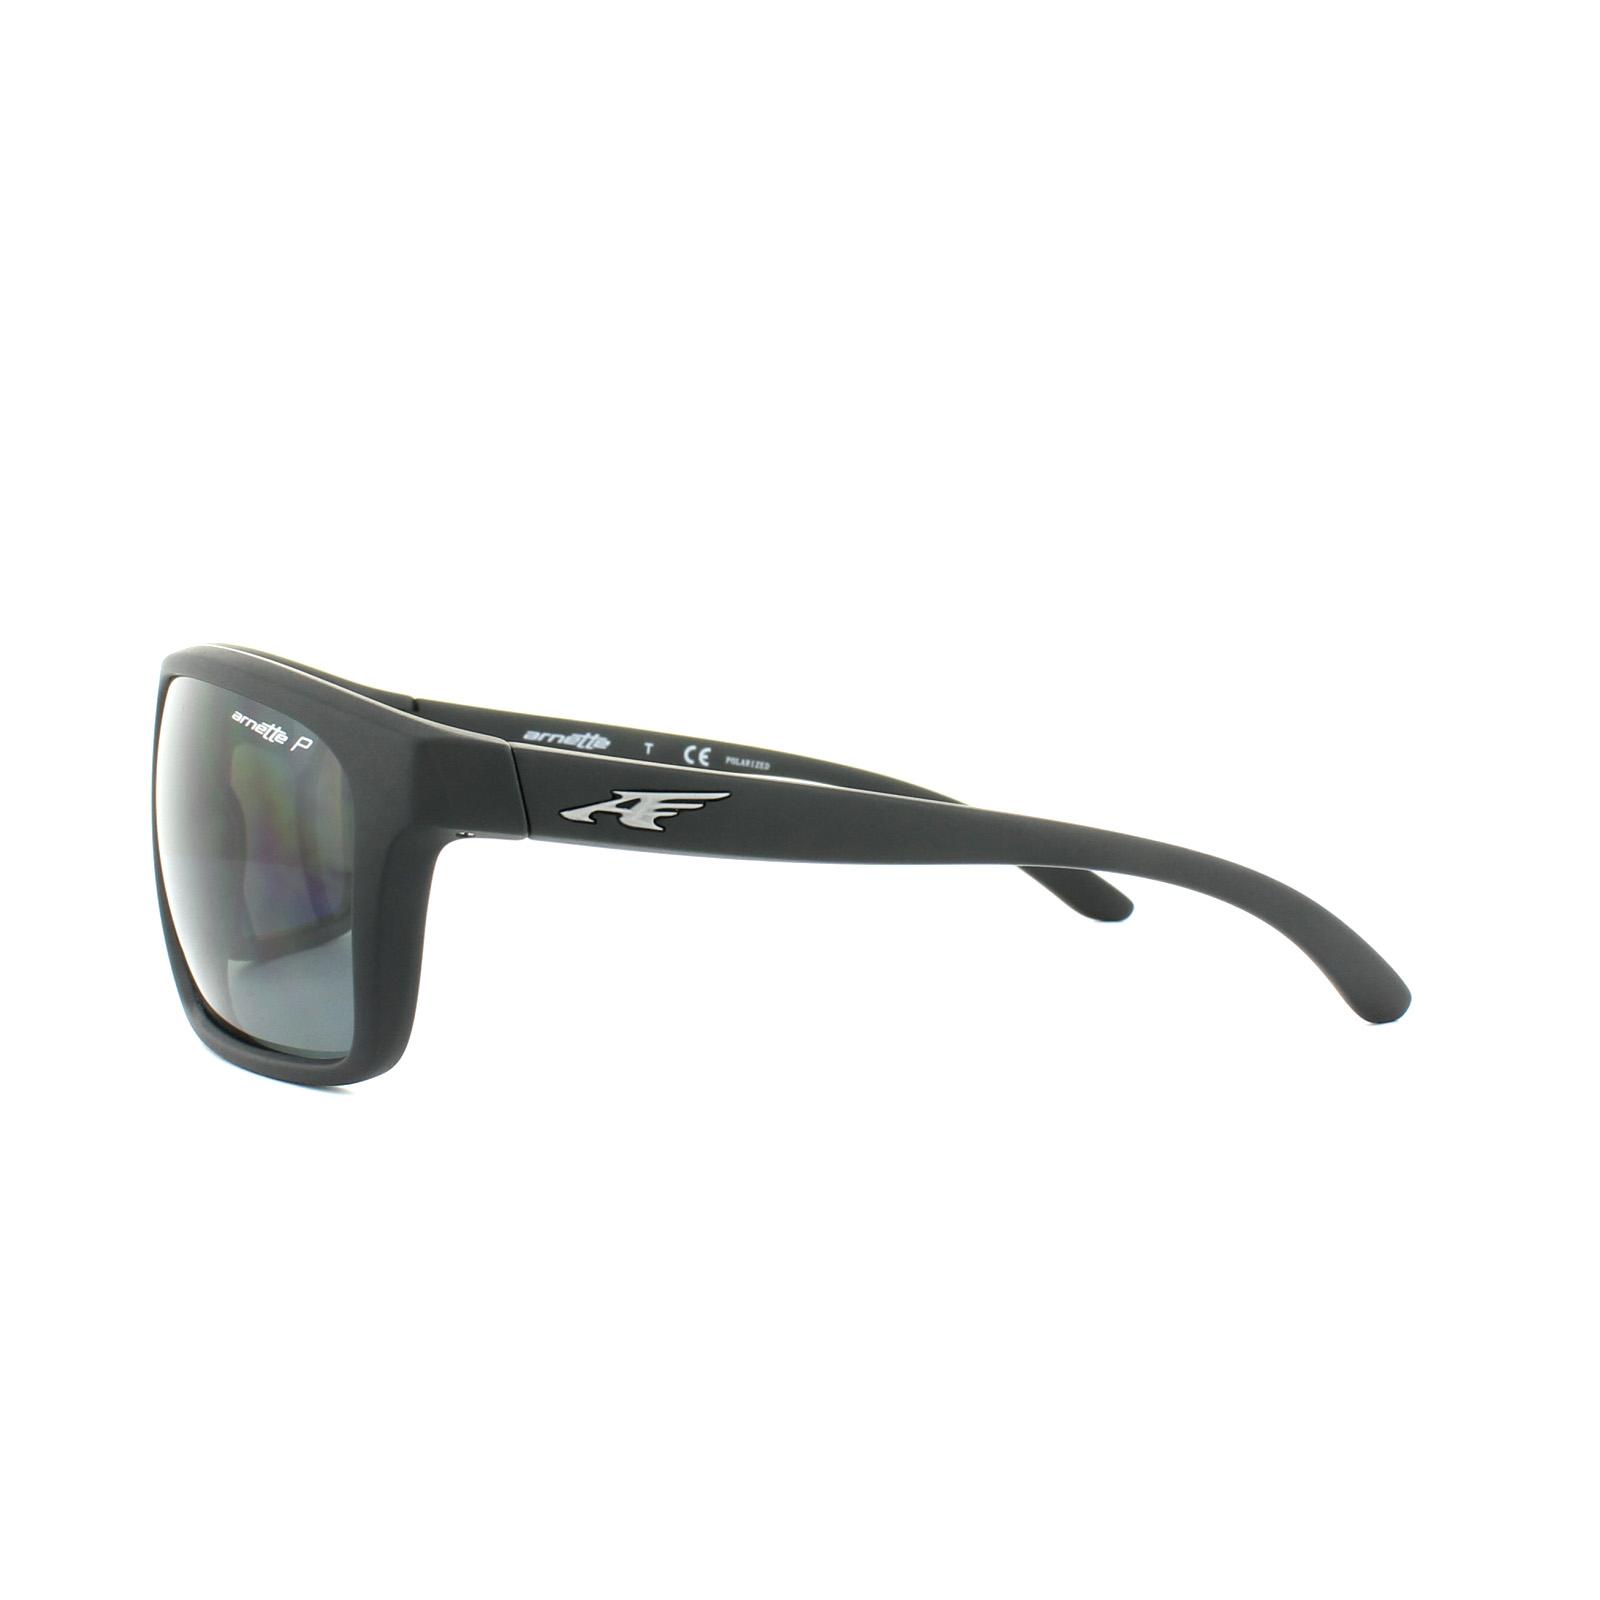 b64d12fd98 Sentinel Arnette Sunglasses Sandbank 4229 01 81 Matt Black Grey Polarized